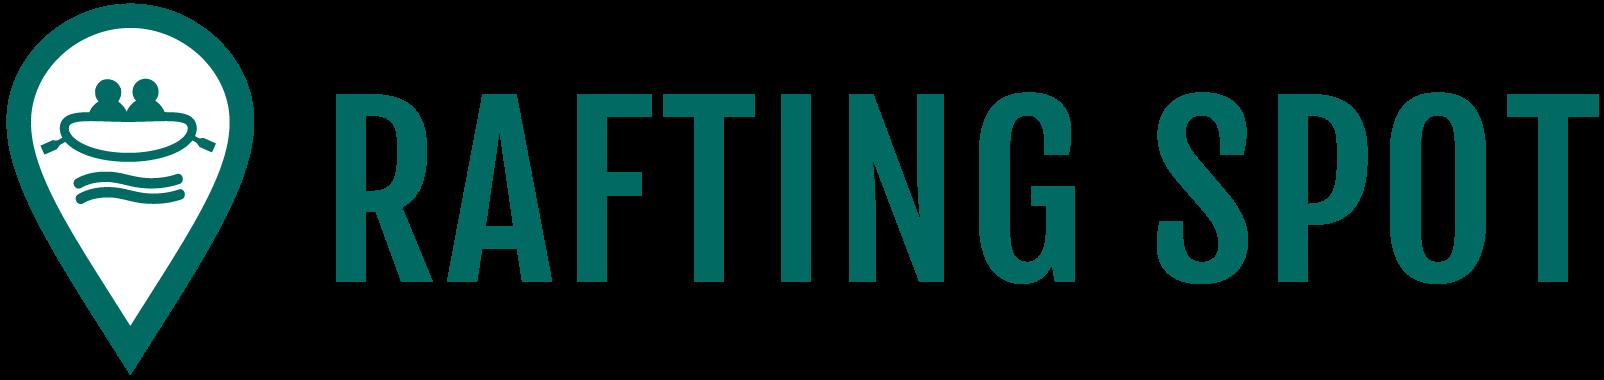 Rafting Spot